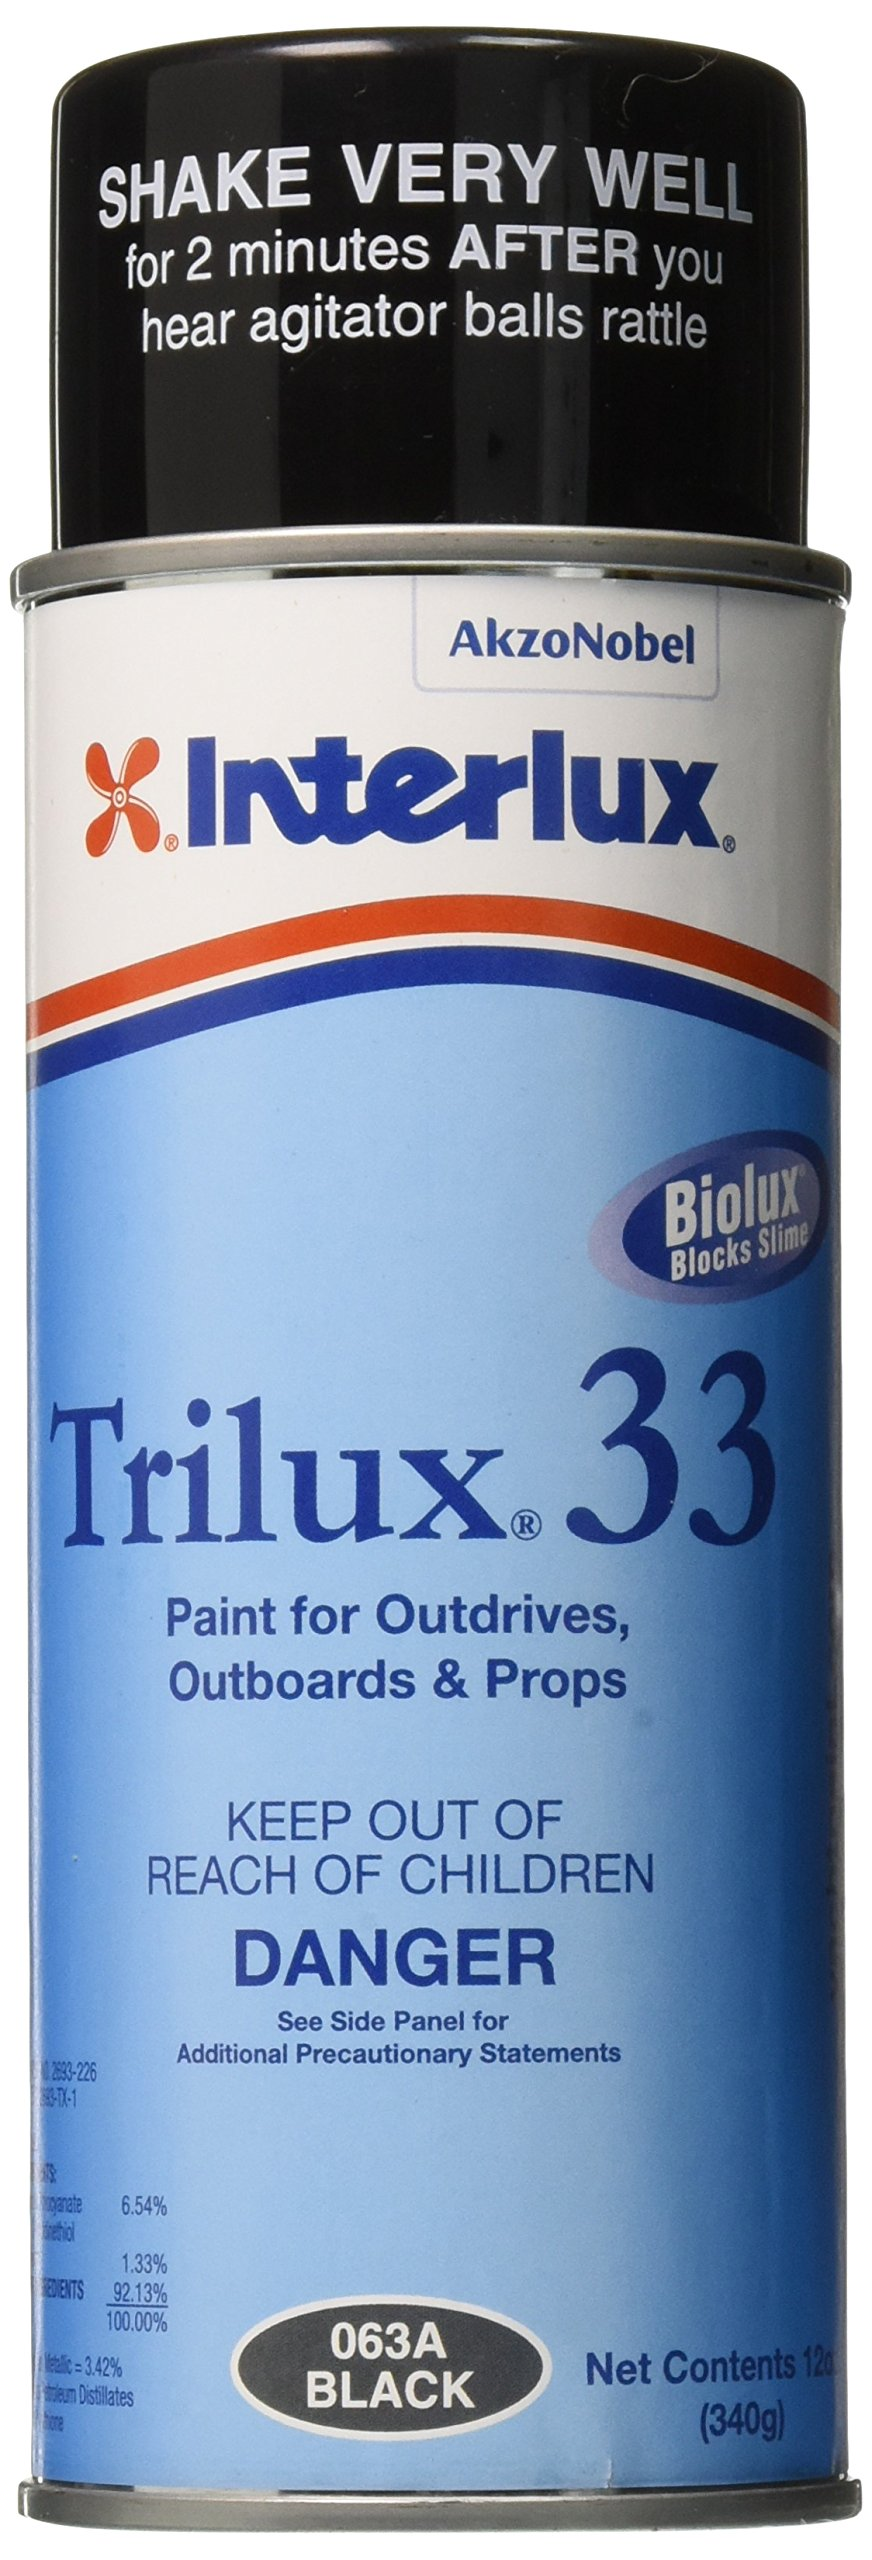 Interlux YBA063A/16 Aerosol Antifouling Paint (Black, 16 oz.) by Interlux